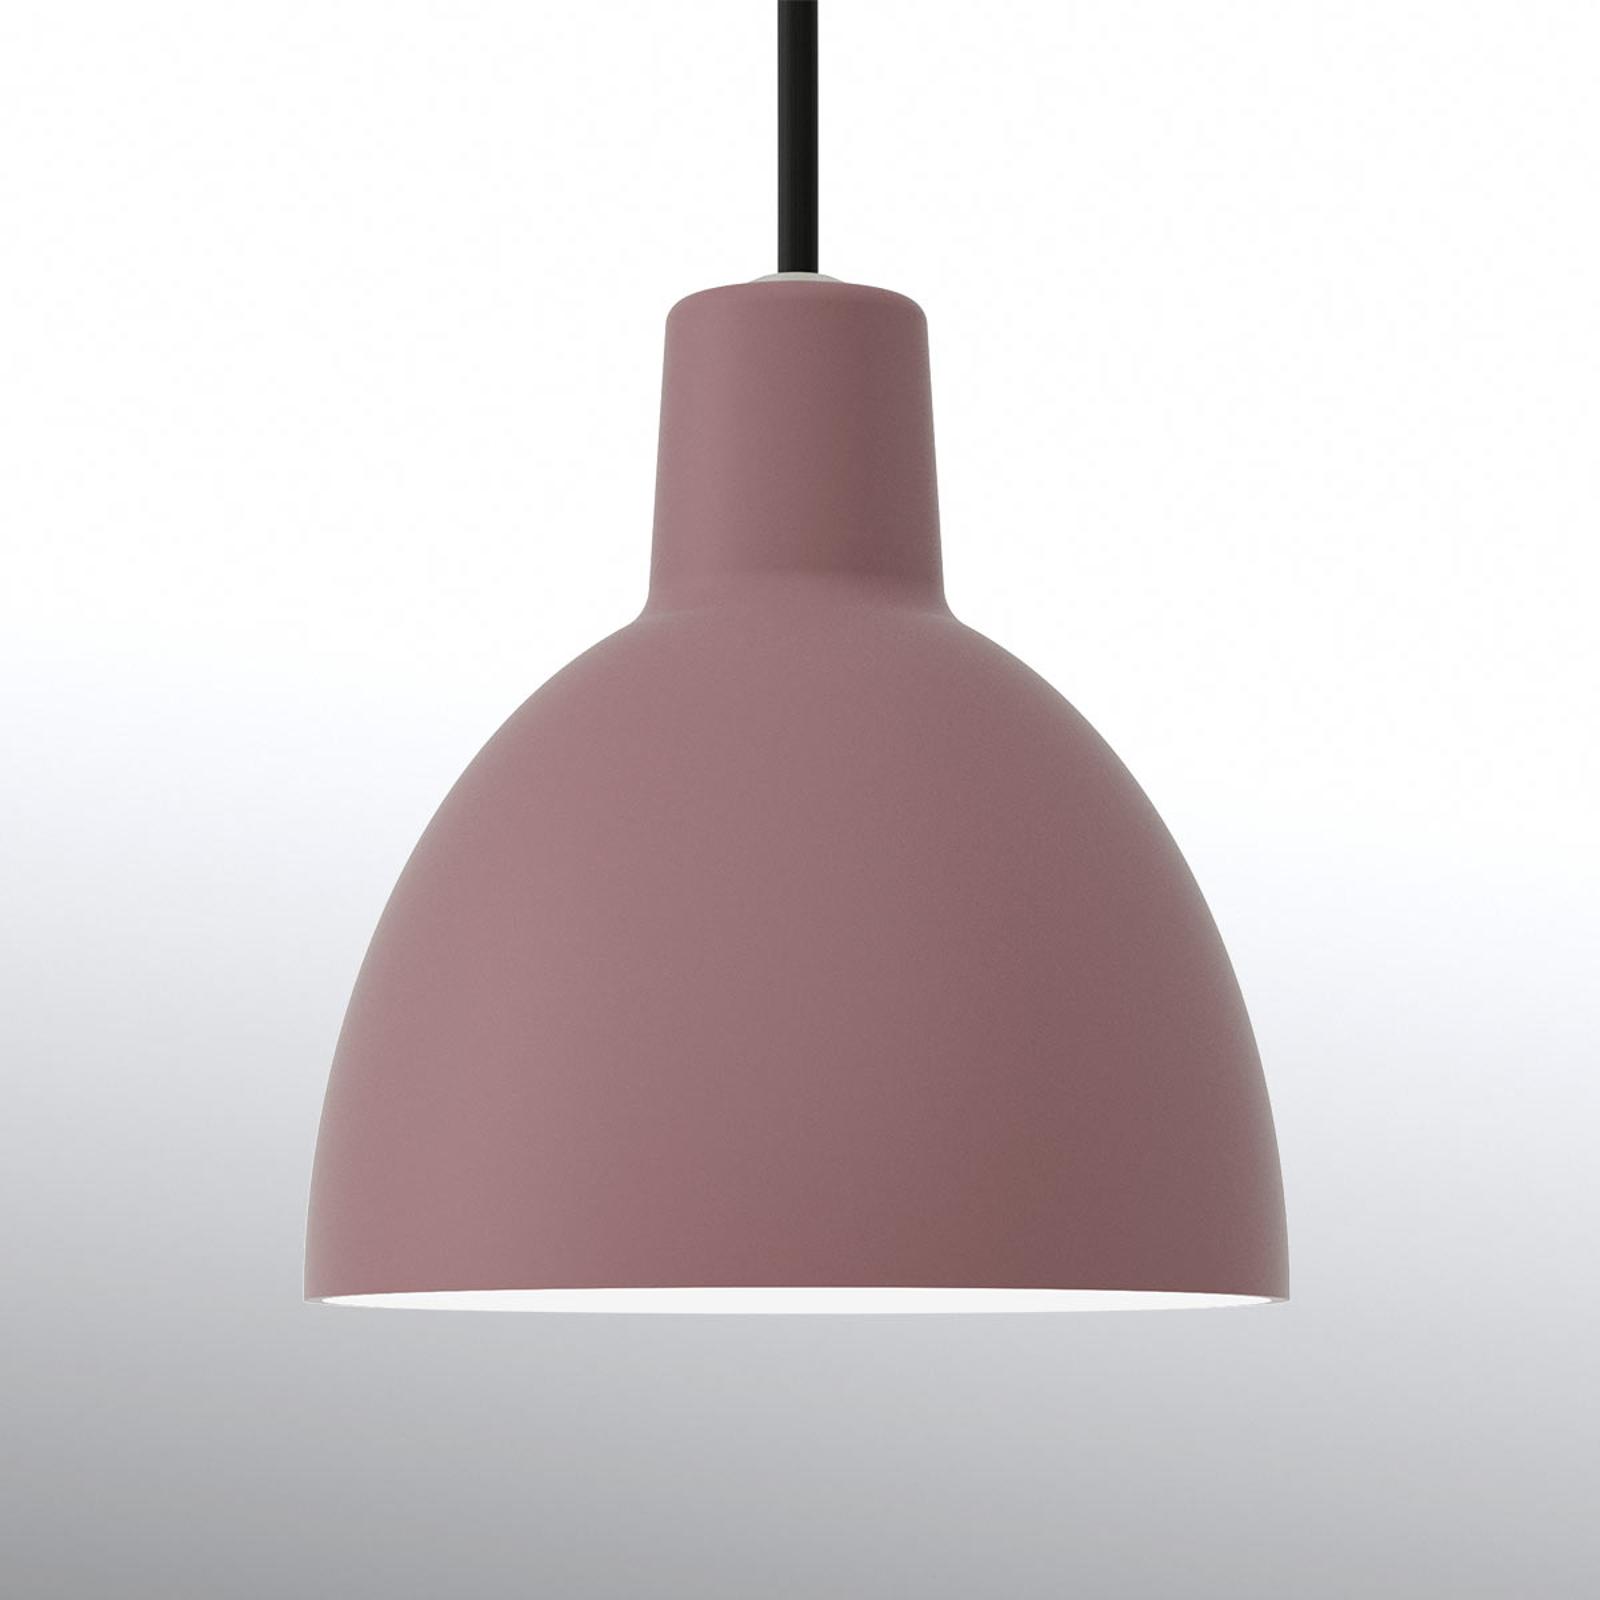 Minimalistische hanglamp Toldbod 120, donker rosé